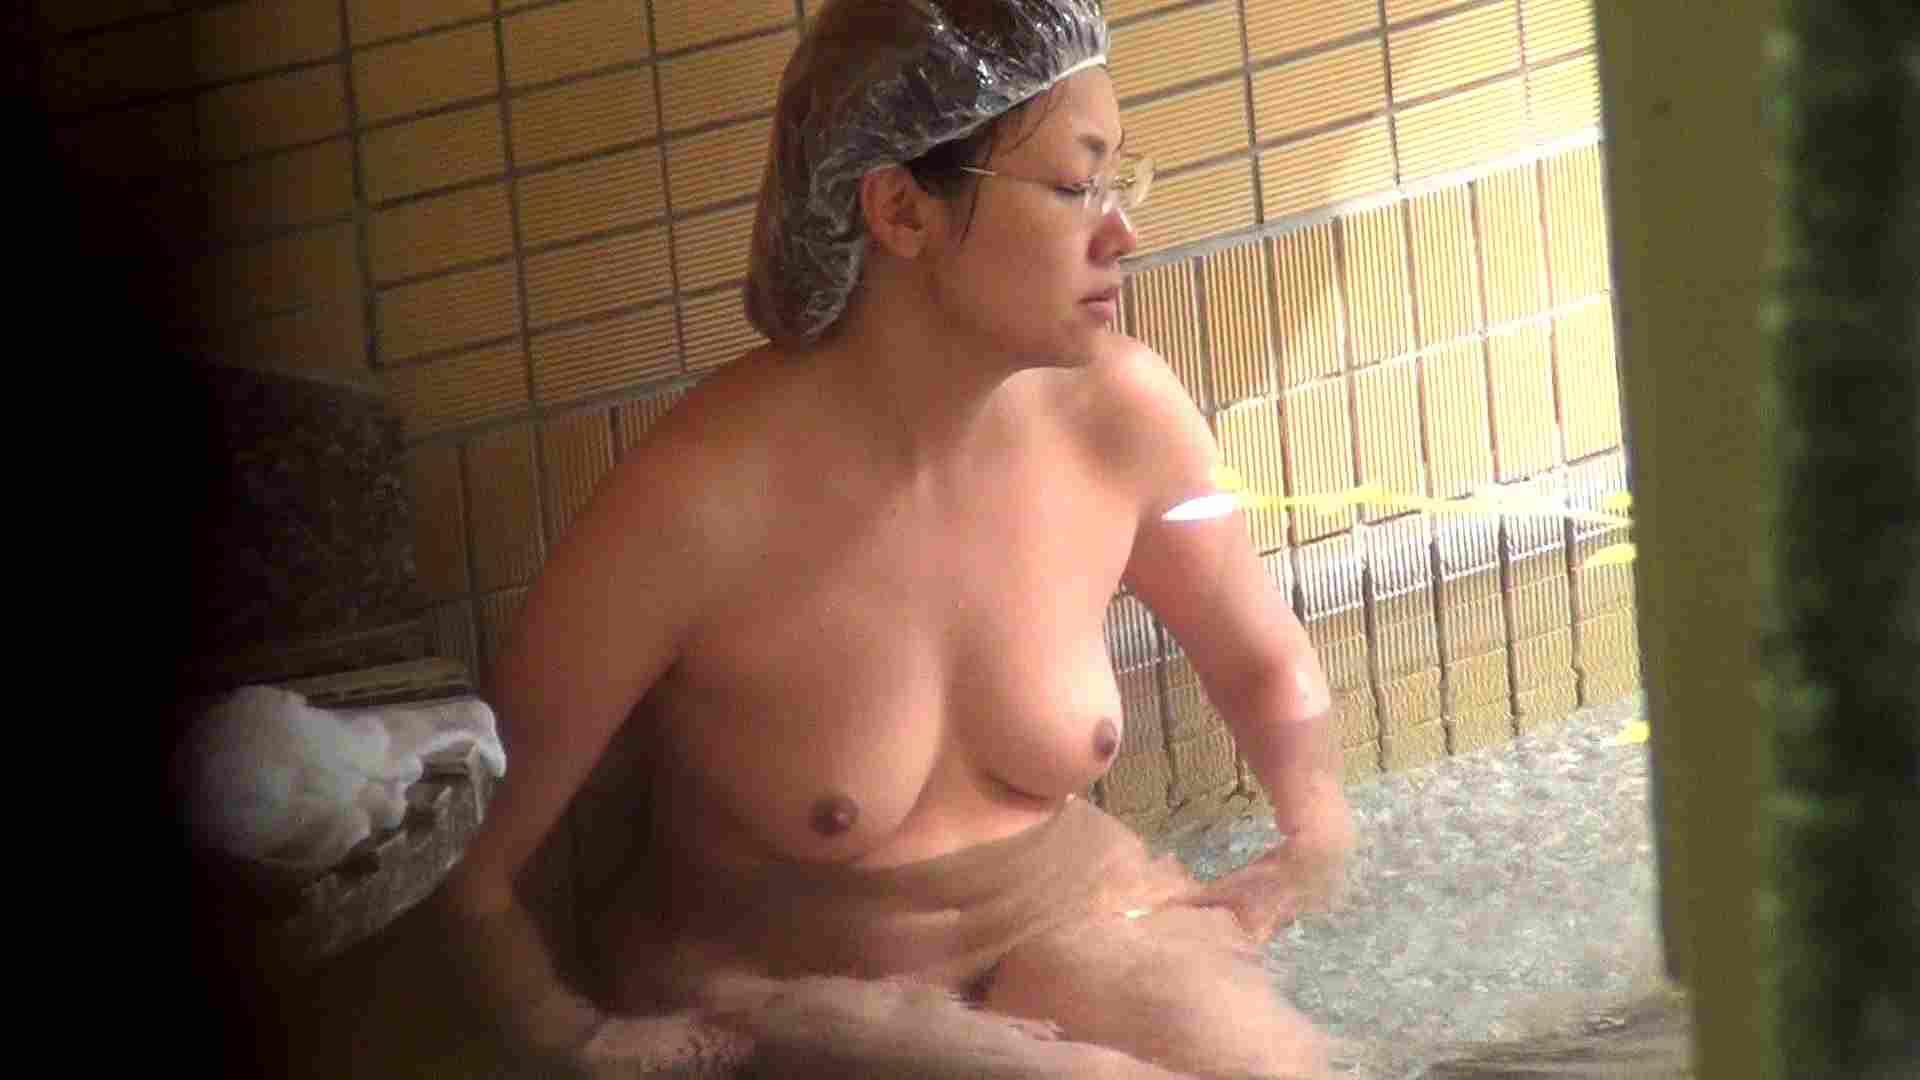 Aquaな露天風呂Vol.280 露天風呂突入 SEX無修正画像 100pic 92